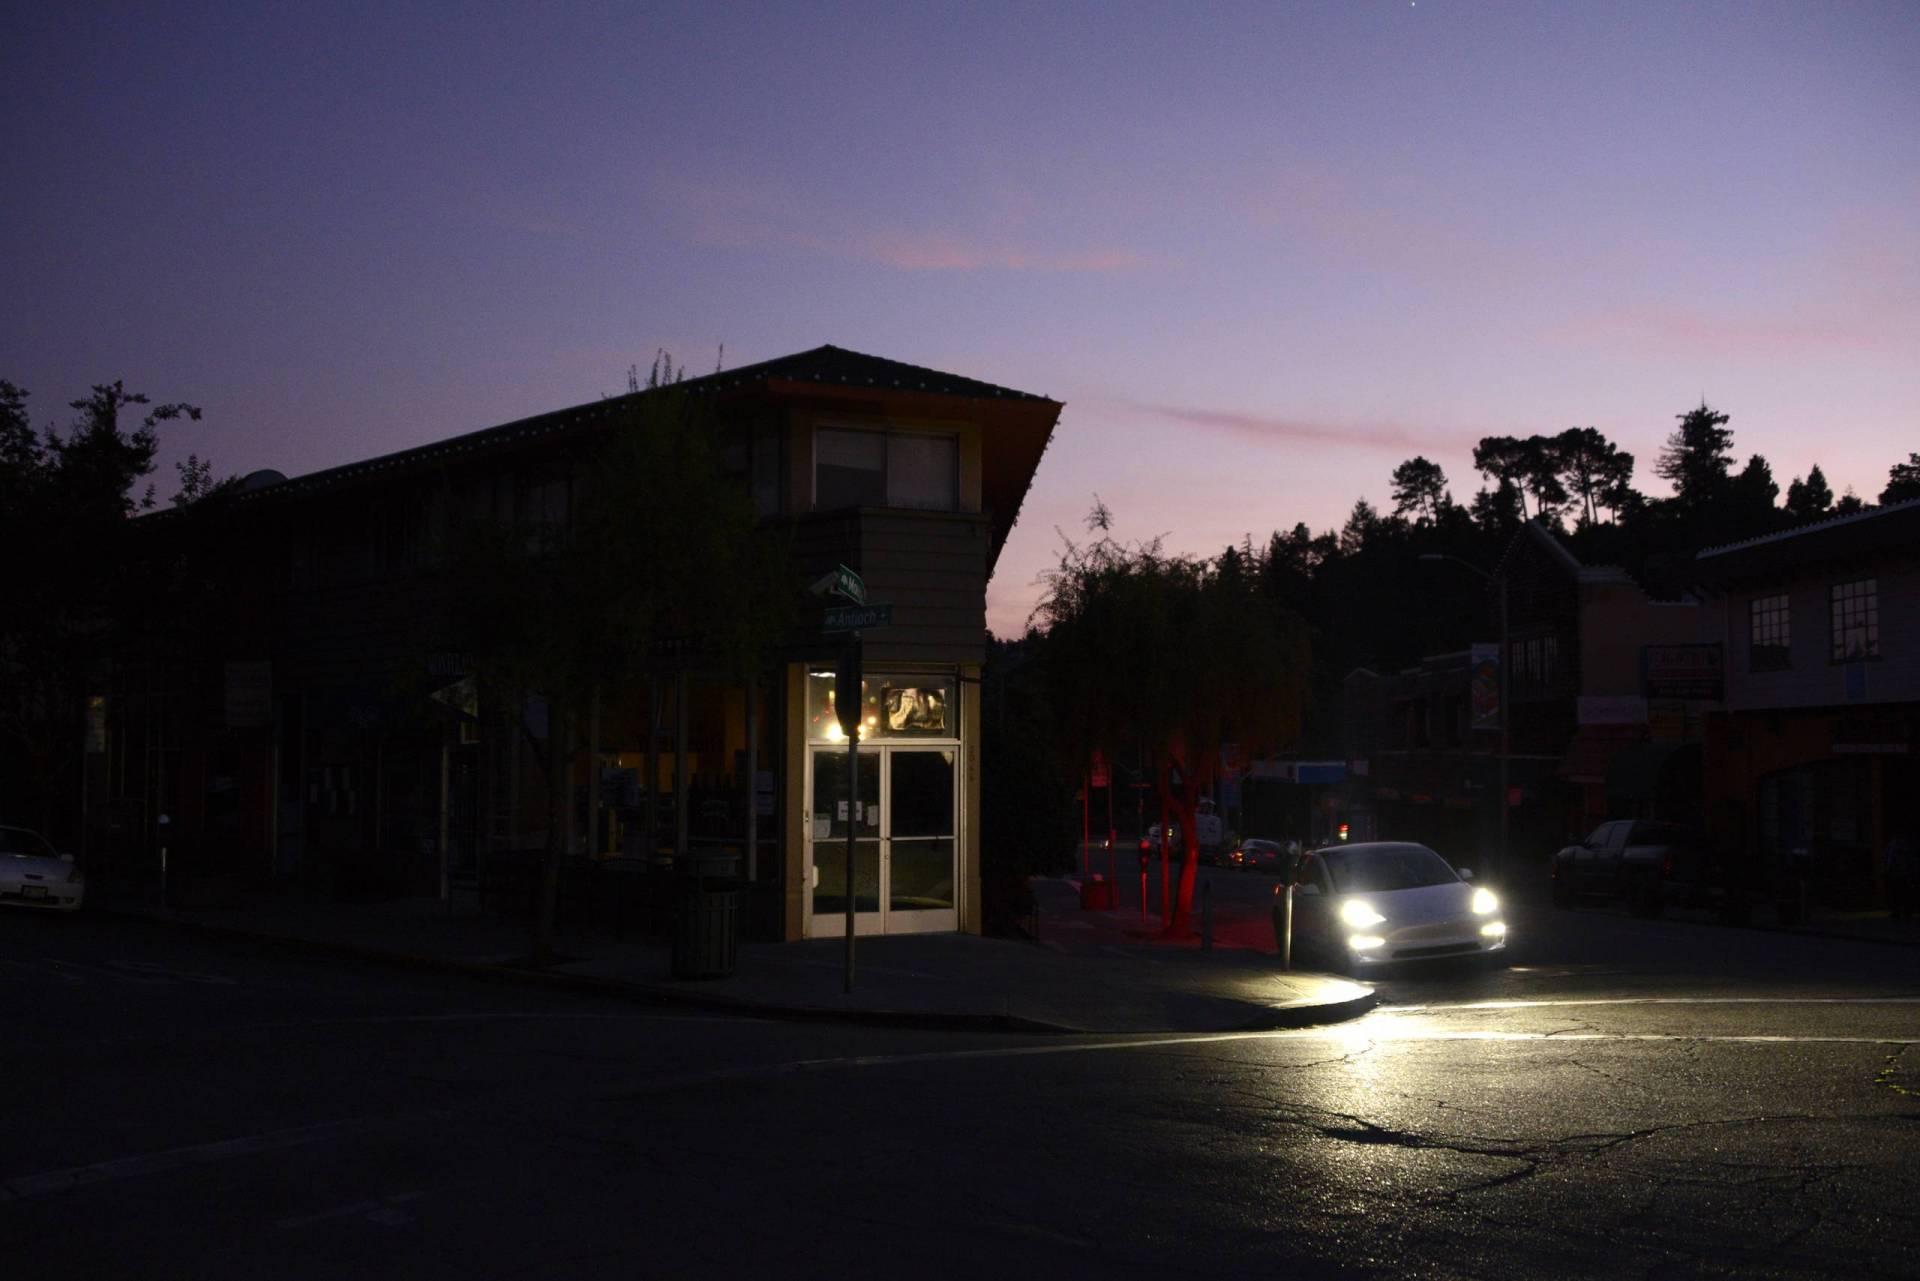 Oakland's darkened Montclair neighborhood at dusk during a PG&E power shutoff on Oct. 10, 2019.